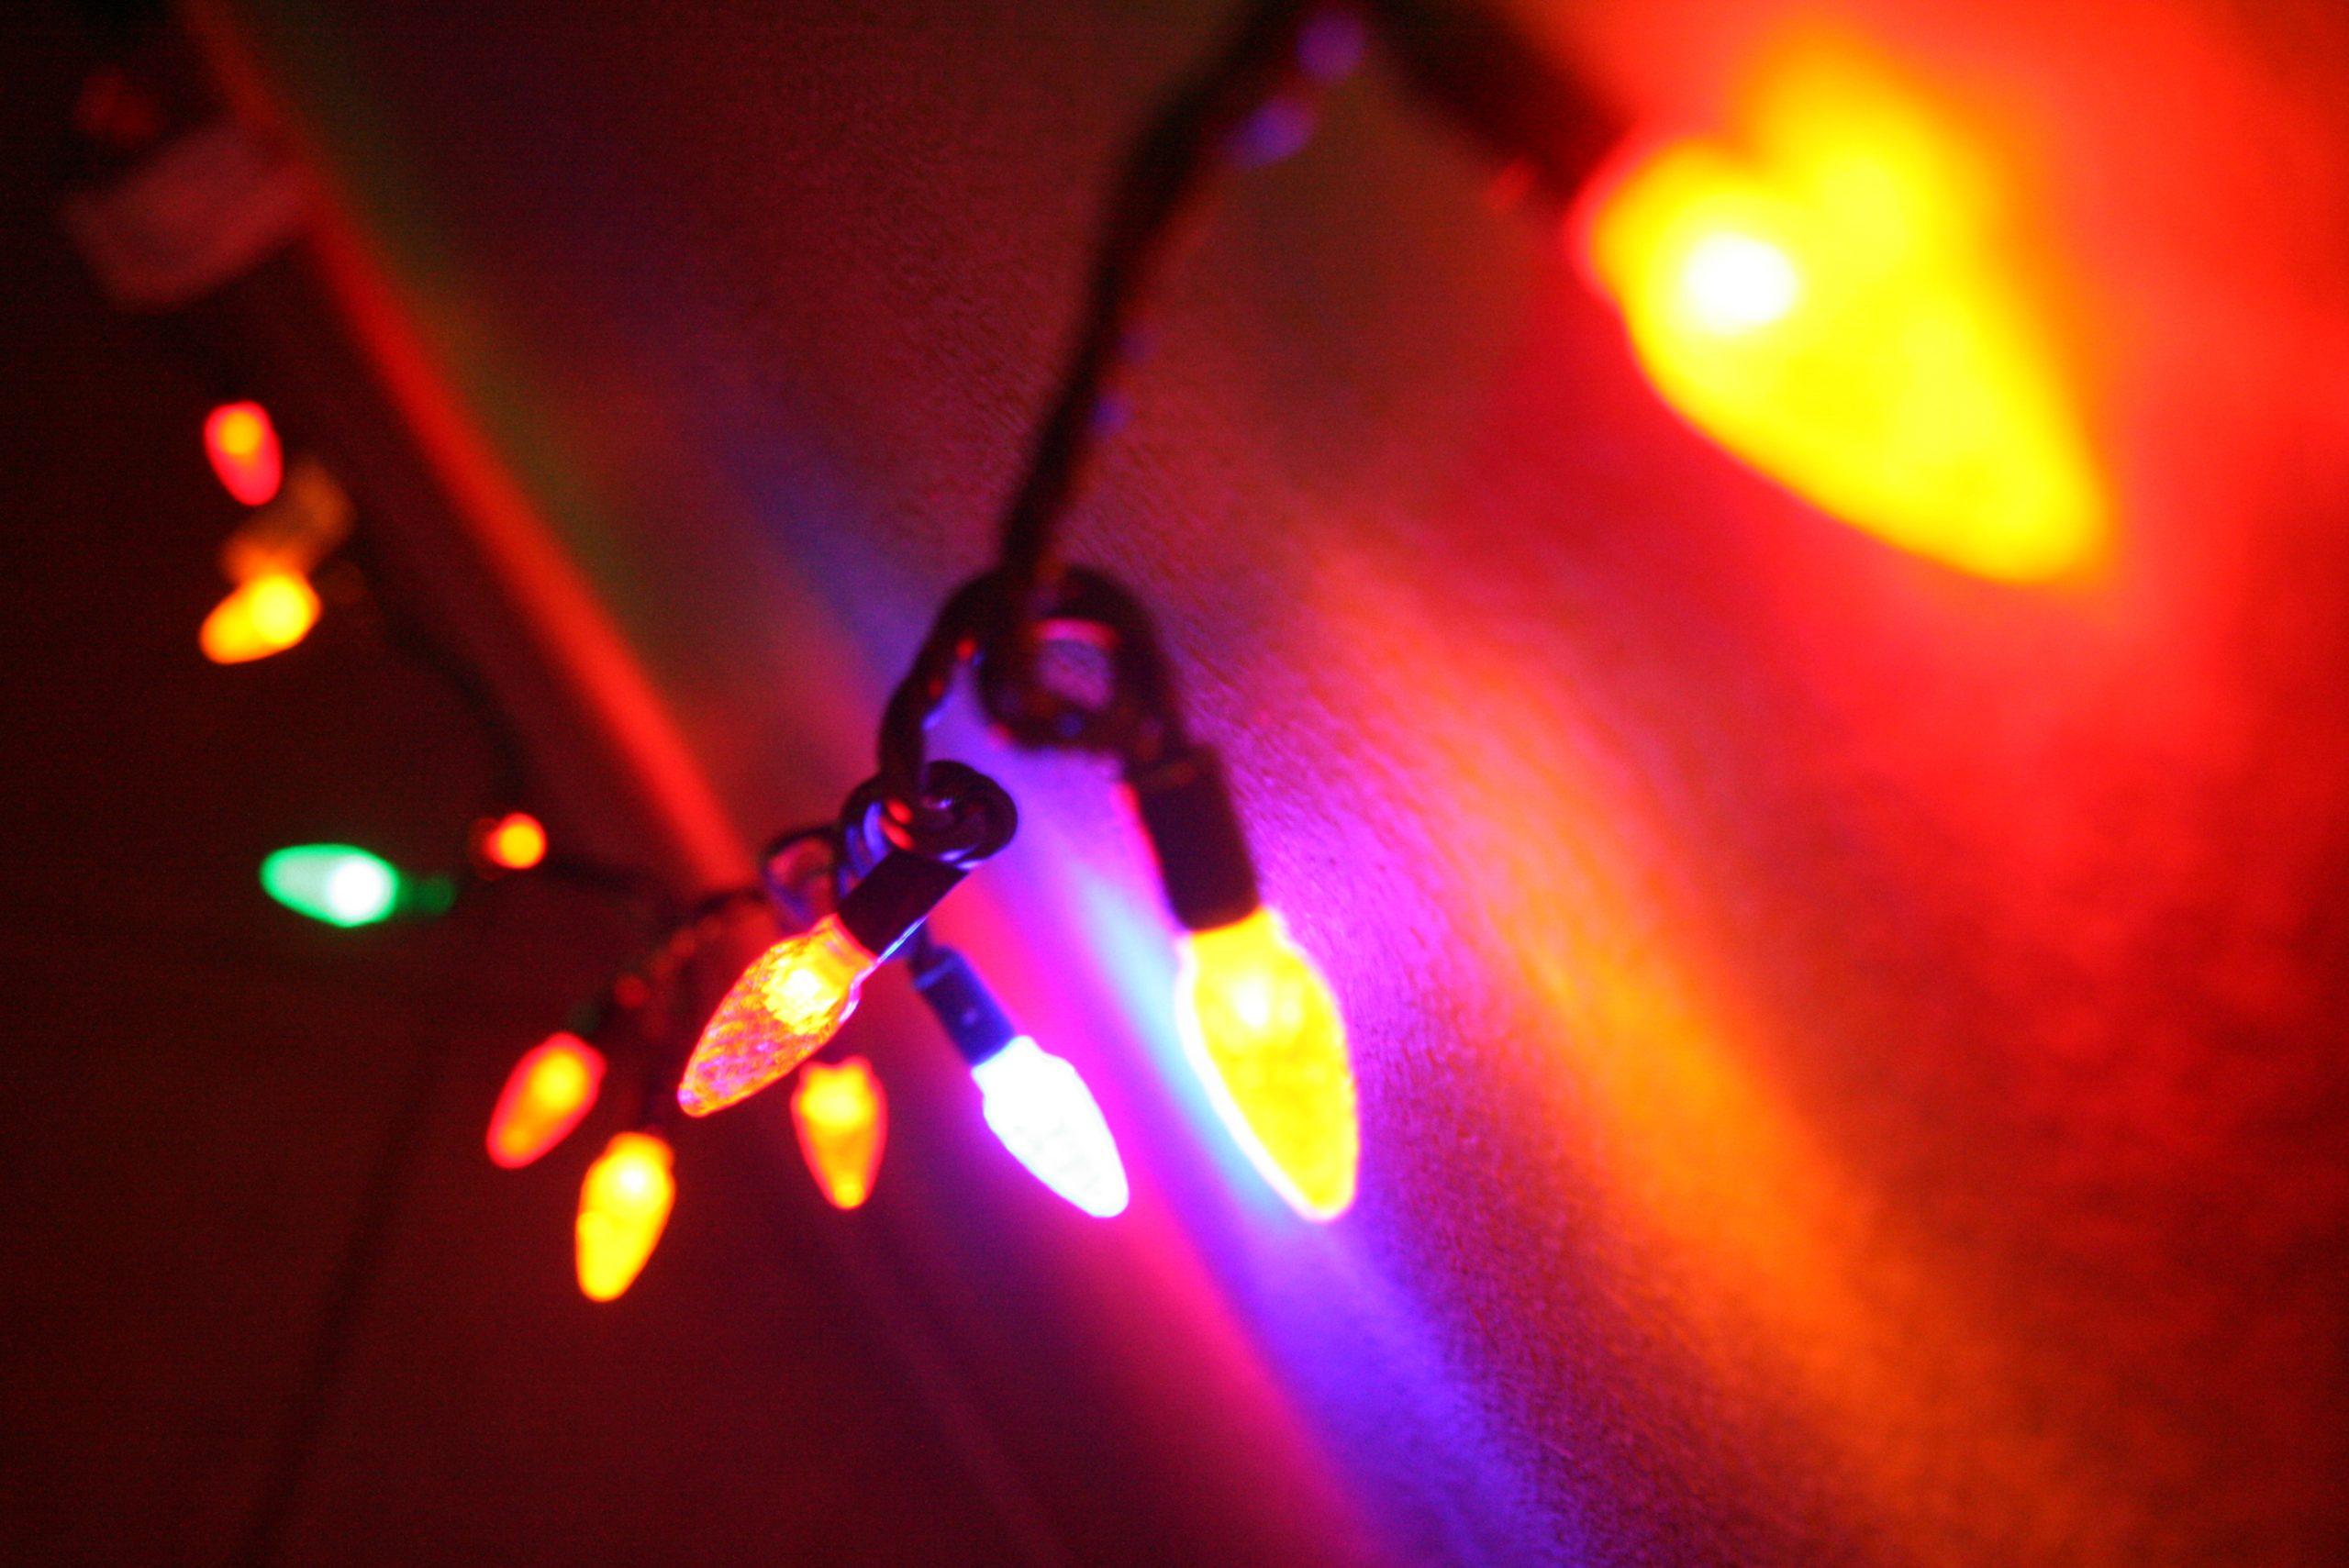 Nearby Light Source Twinkle Lights